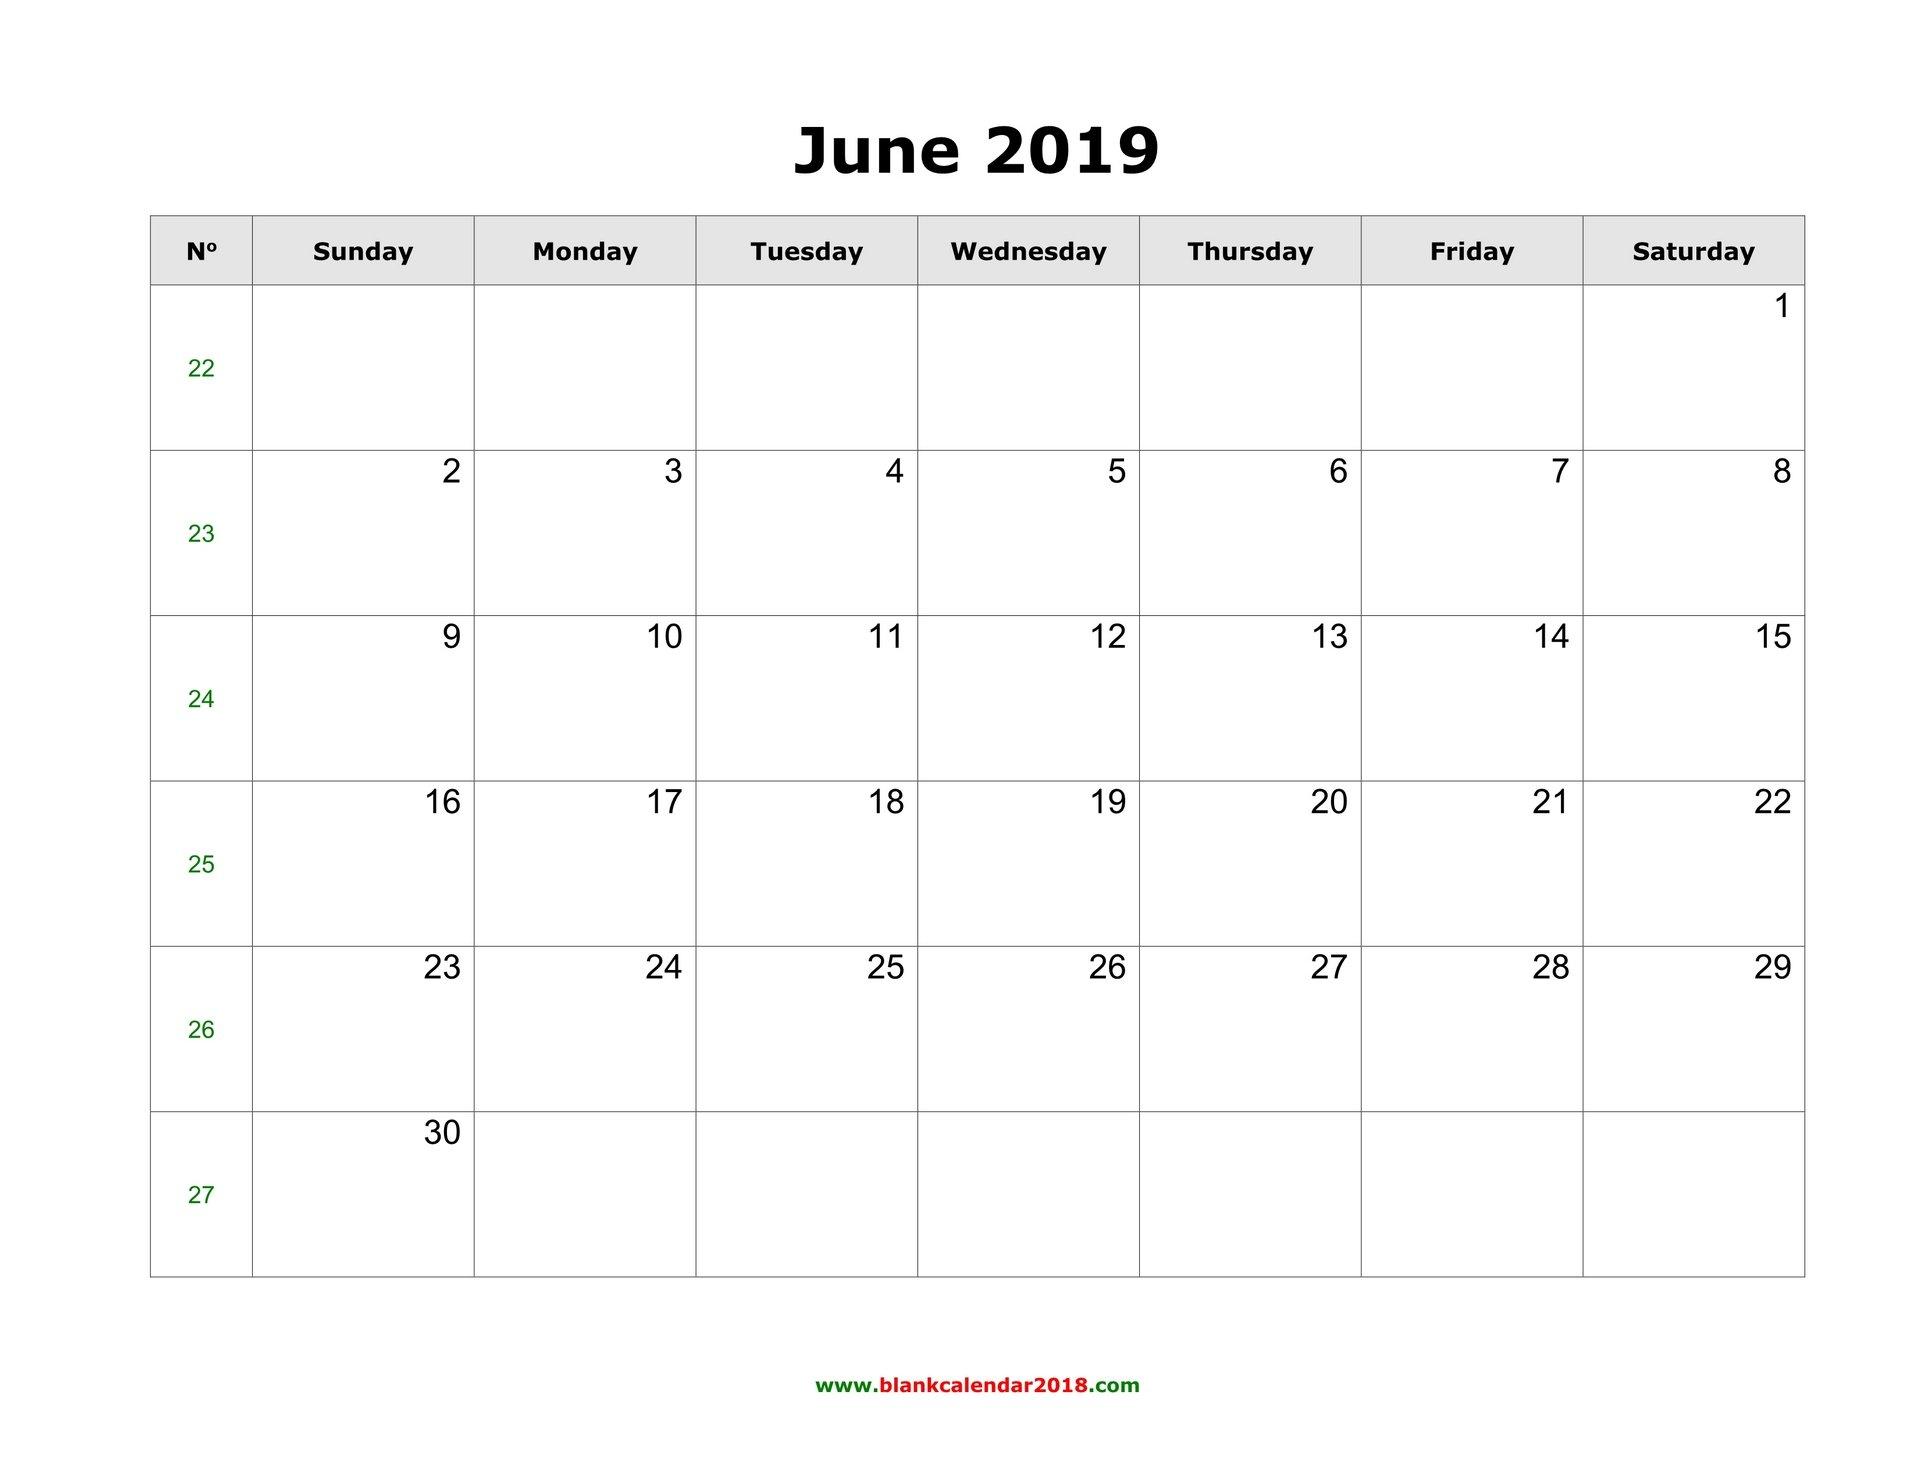 Blank Calendar For June 2019 Cal U Calendar 2019